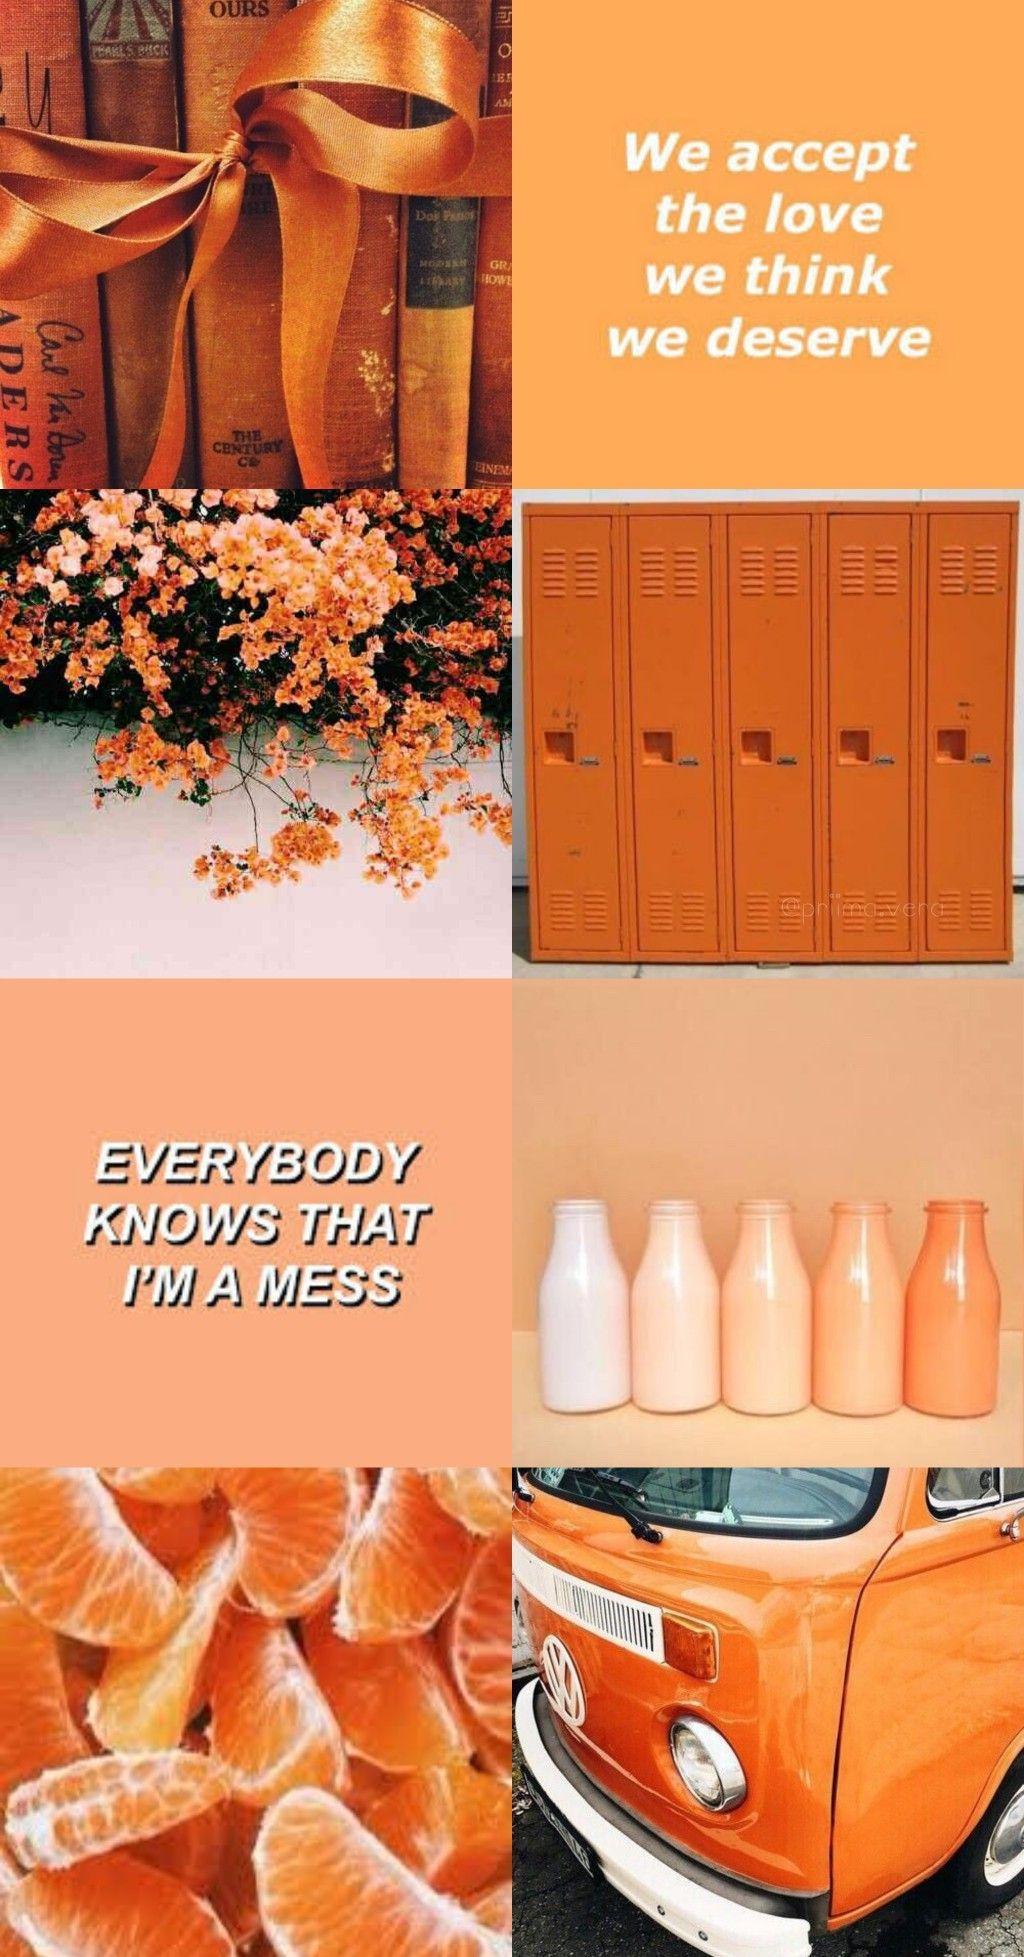 #honey lips#lips#cute#homescreen#lockscreen#wallpaper#aesthetic wallpaper#girl wallpaper#black wallpaper… see all. Pastel Orange Aesthetic Wallpapers - Wallpaper Cave